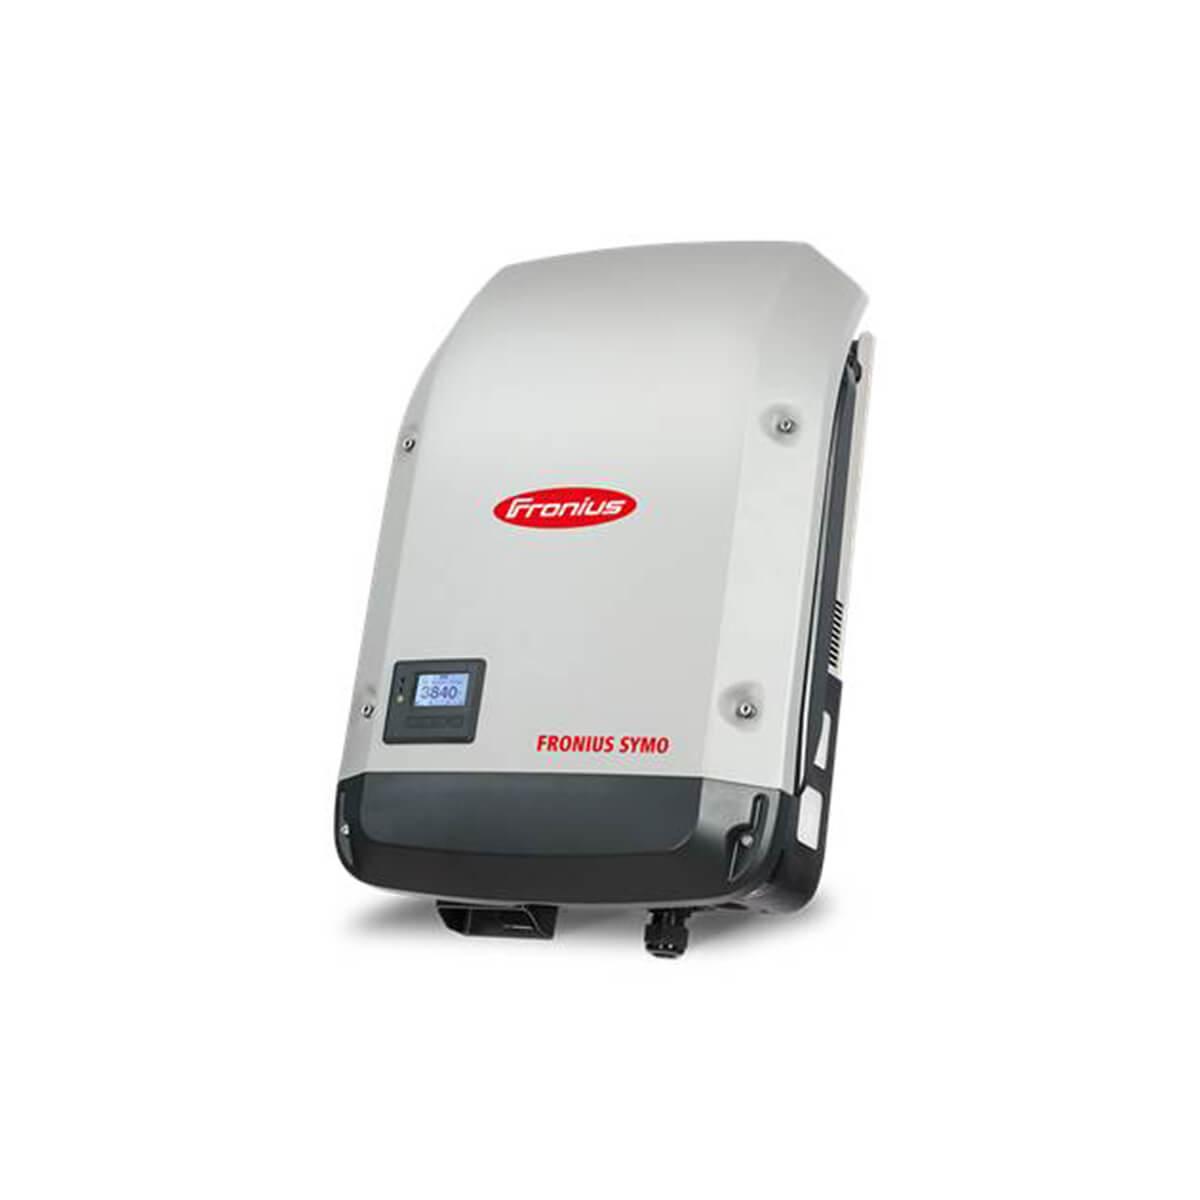 fronius 8.2kW inverter, fronius symo 8.2kW inverter, fronius symo 8.2-3-m inverter, fronius symo 8.2-3-m, fronius symo 8.2 kW, FRONIUS 8.2 KW